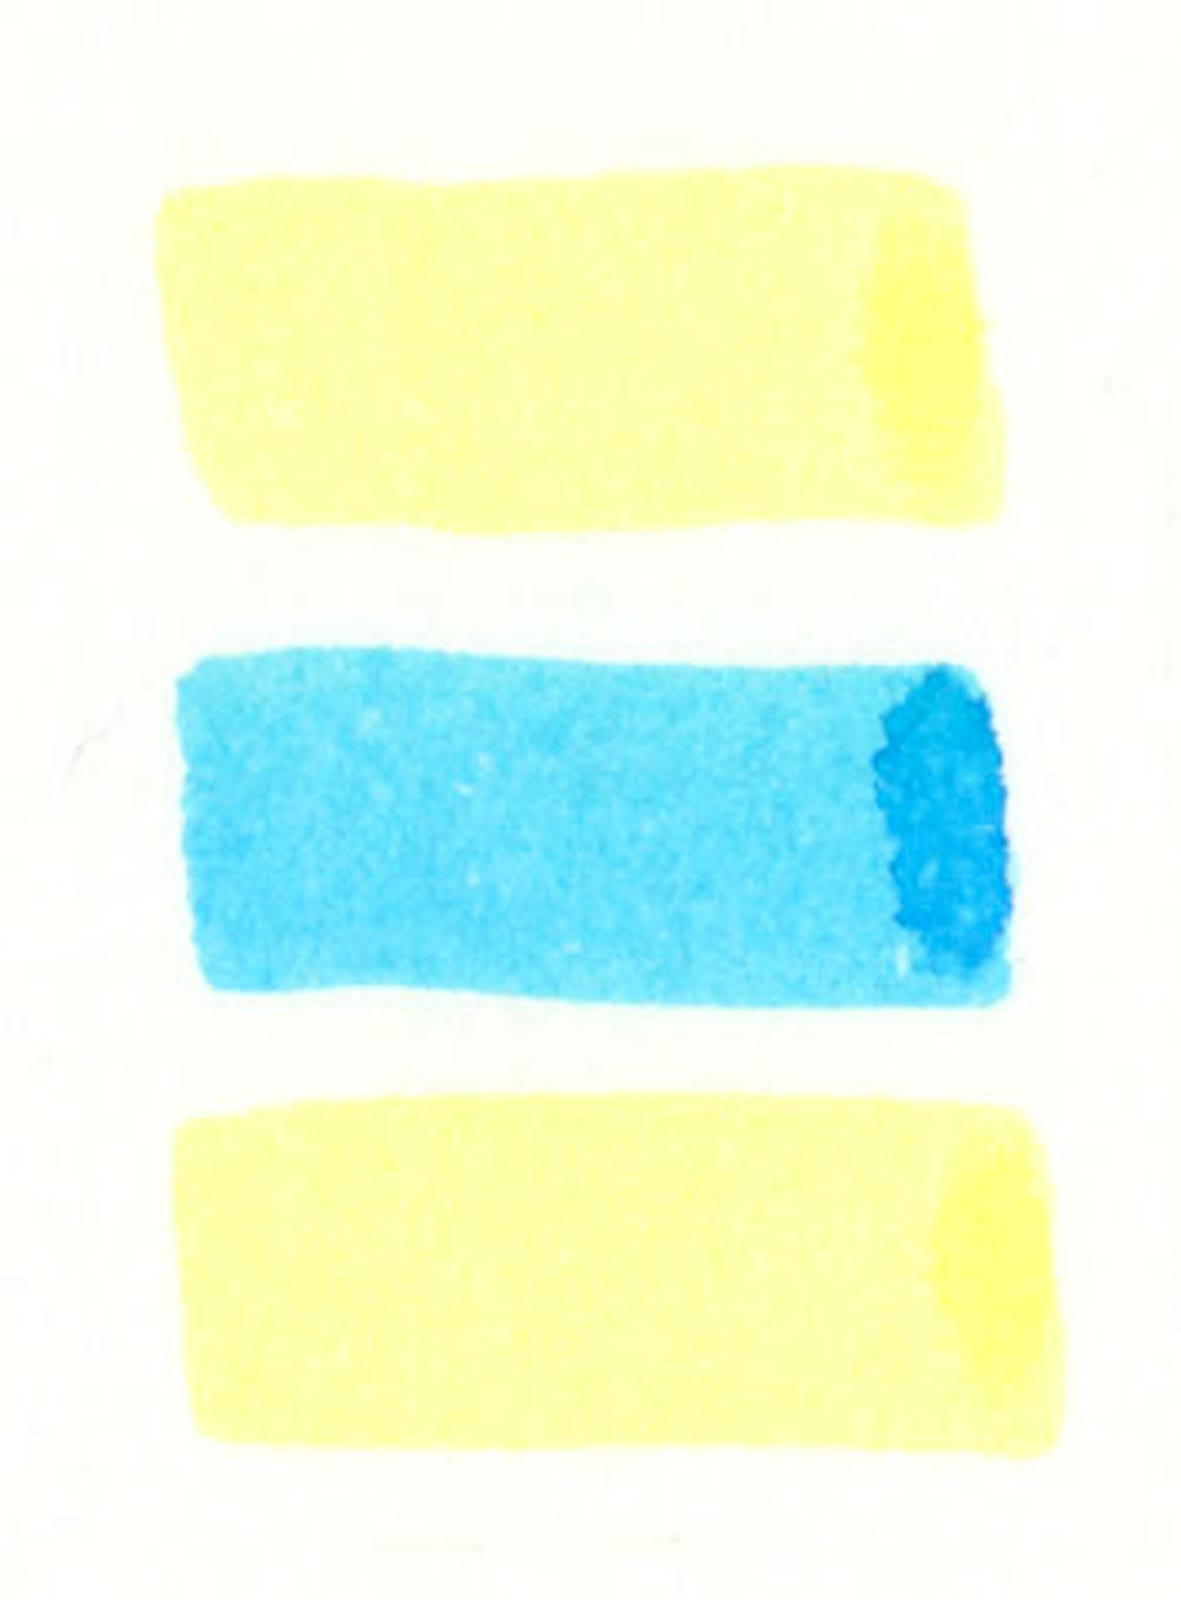 "<span class=""link fancybox-details-link""><a href=""/artists/42-ignacio-uriarte/works/13496/"">View Detail Page</a></span><div class=""artist""><strong>IGNACIO URIARTE</strong></div> <div class=""title""><em>Fluorescent Animation</em>, 2009</div> <div class=""medium"">video</div> <div class=""dimensions"">2:48 minutes</div> <div class=""edition_details"">Edition of 5 plus 1 artist's proof</div>"